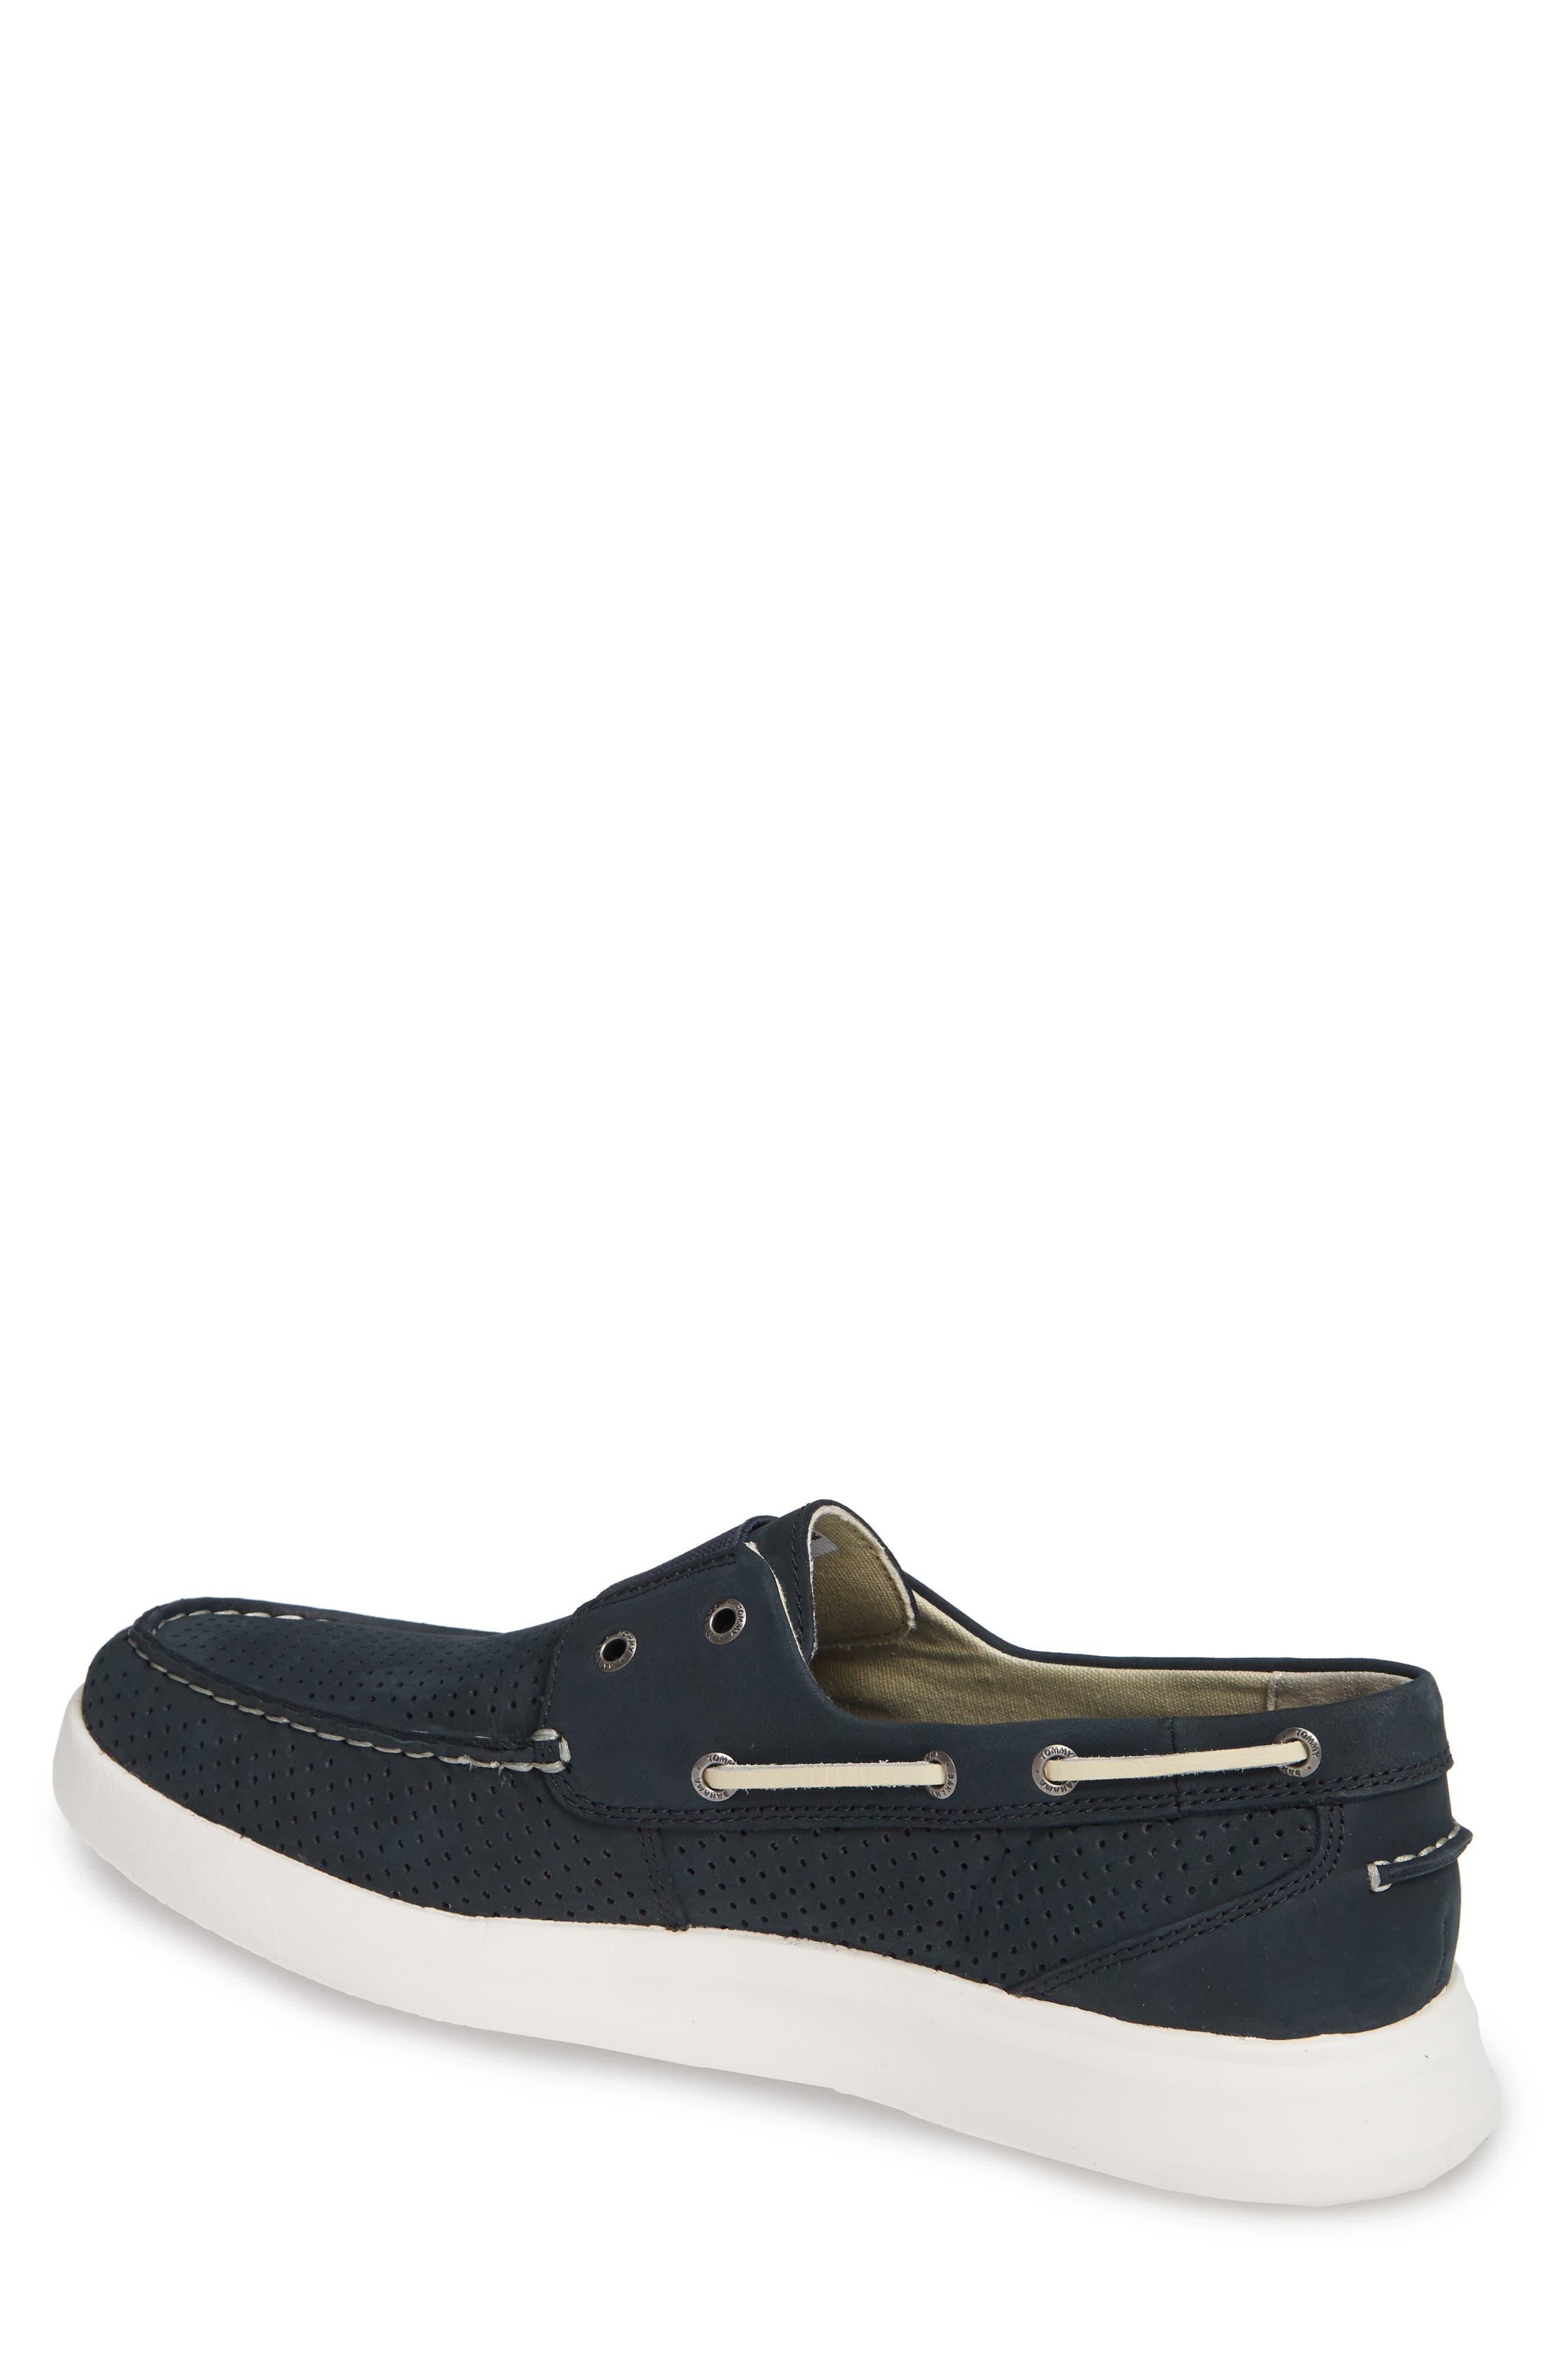 Relaxology<sup>®</sup> Aeonian Boat Shoe,                             Alternate thumbnail 2, color,                             NAVY NUBUCK